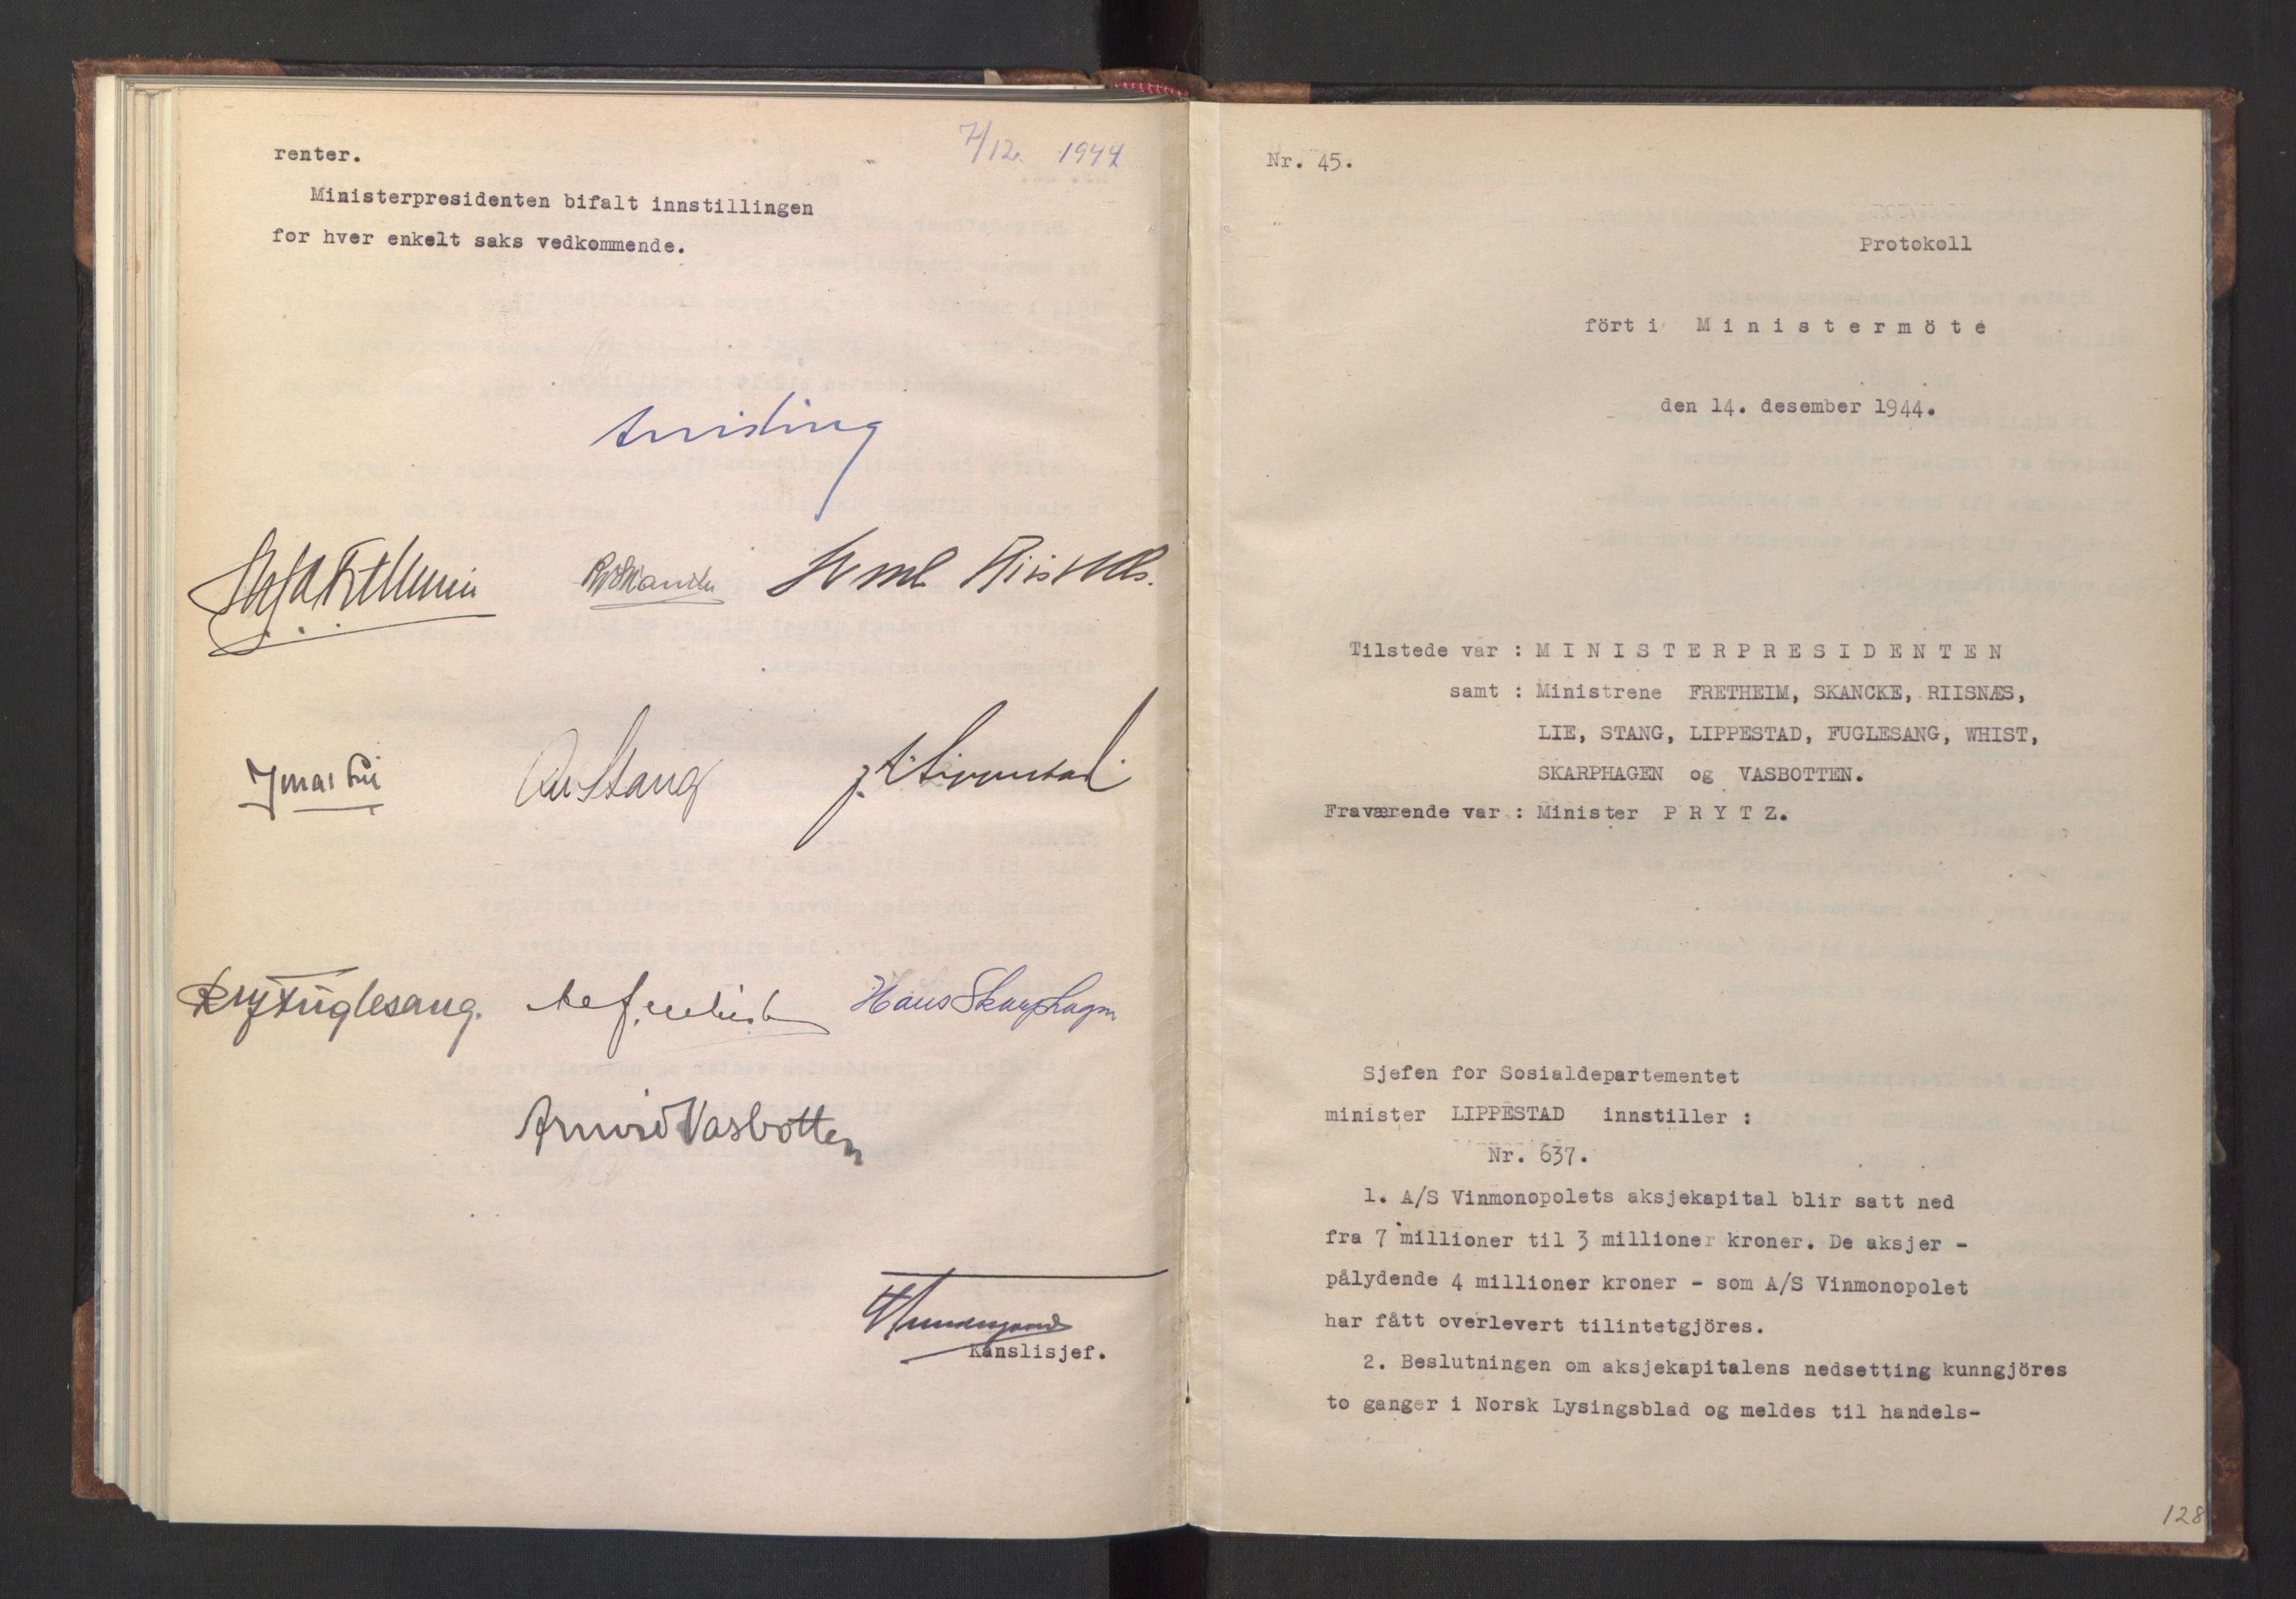 RA, NS-administrasjonen 1940-1945 (Statsrådsekretariatet, de kommisariske statsråder mm), D/Da/L0005: Protokoll fra ministermøter, 1944, s. 127b-128a